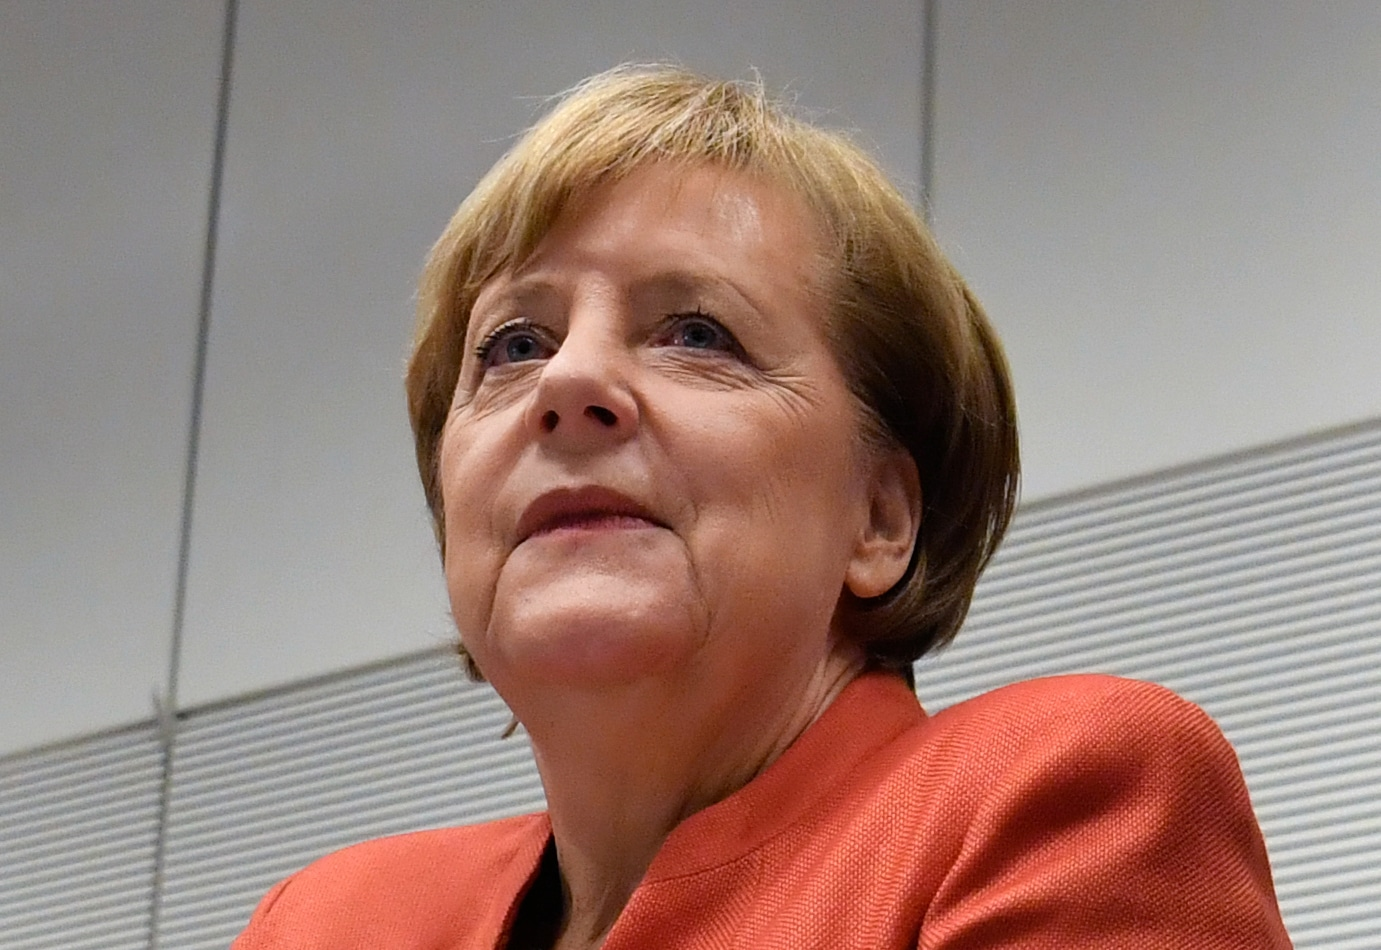 Germania, conferenza stampa Steinmeier alle 14,30 dopo incontro con Merkel